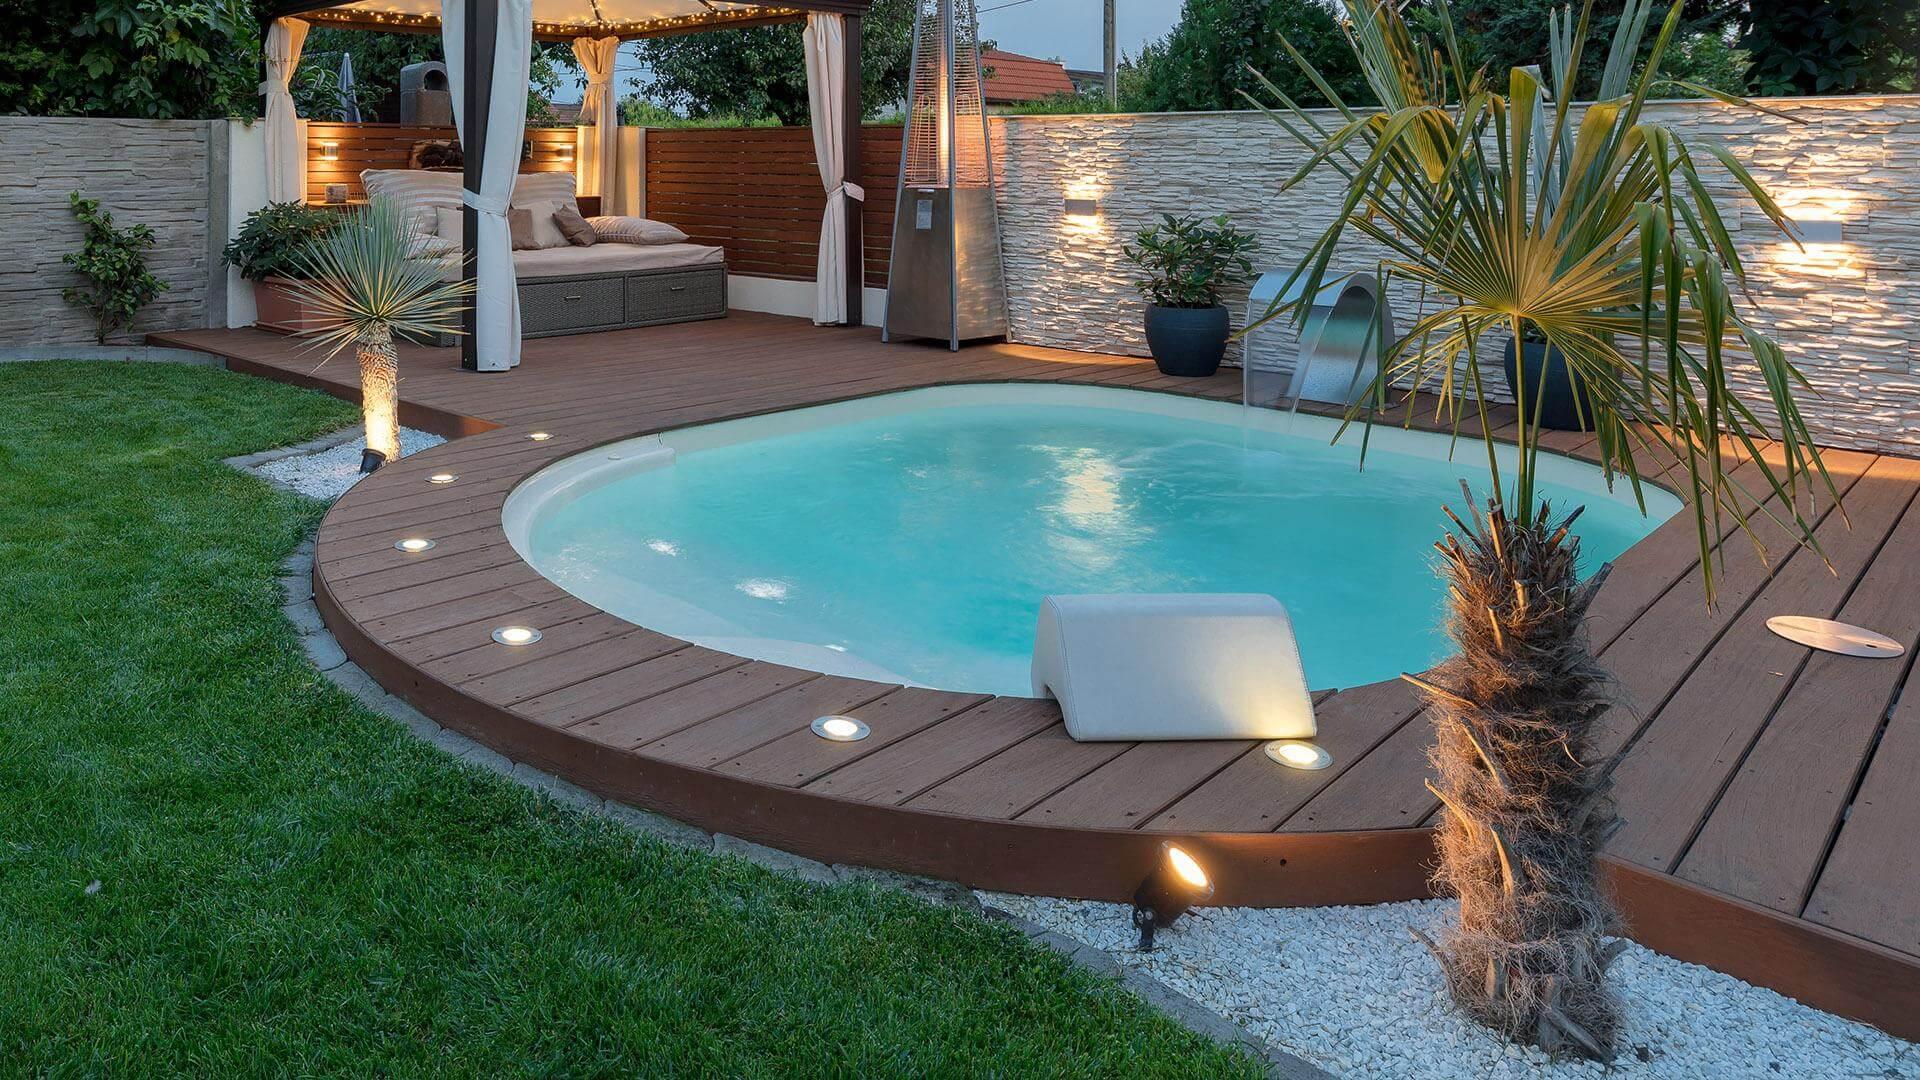 Pool Lola Mini – der kleine Pool für jedermann